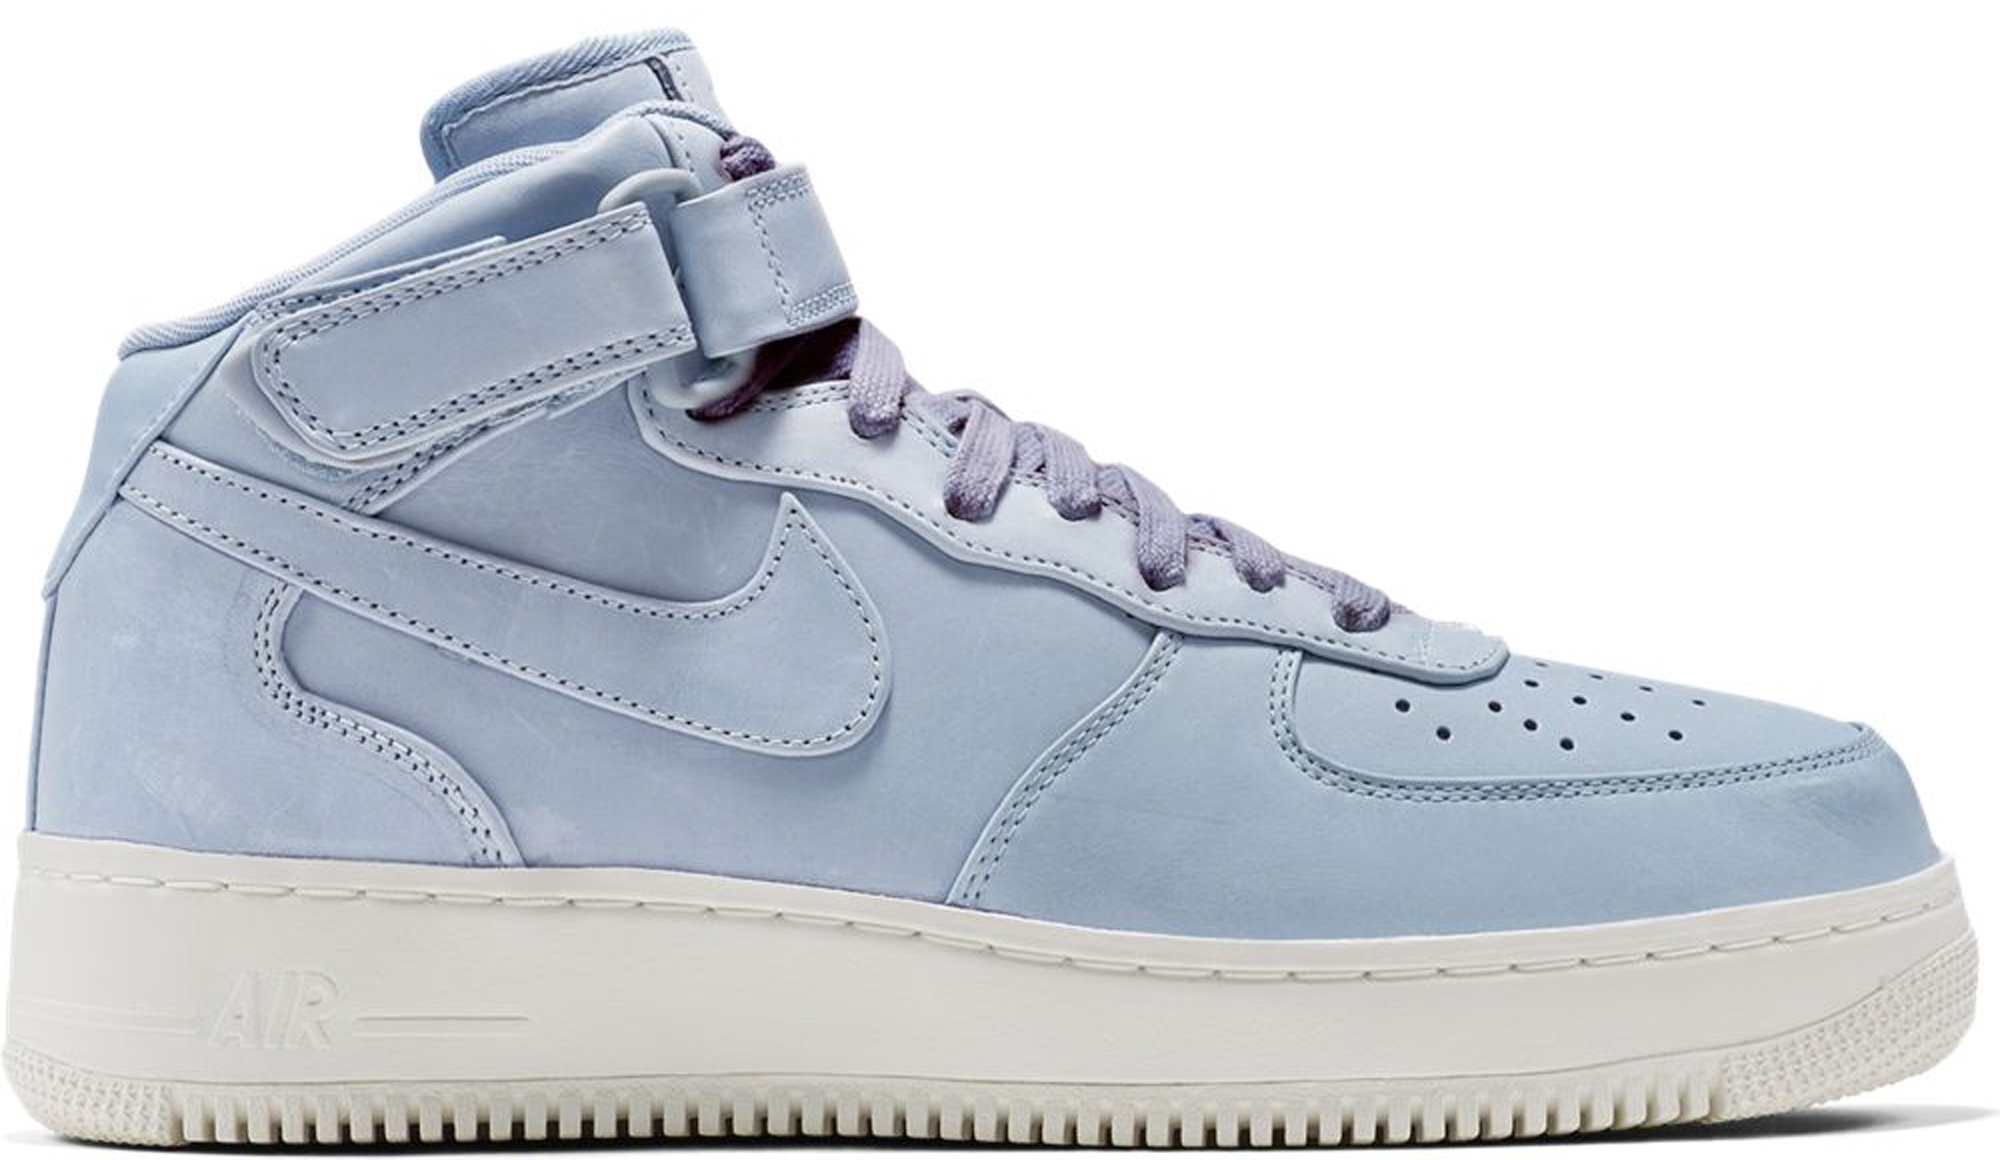 Nike Air Force 1 Mid Blue Grey - 905619-400